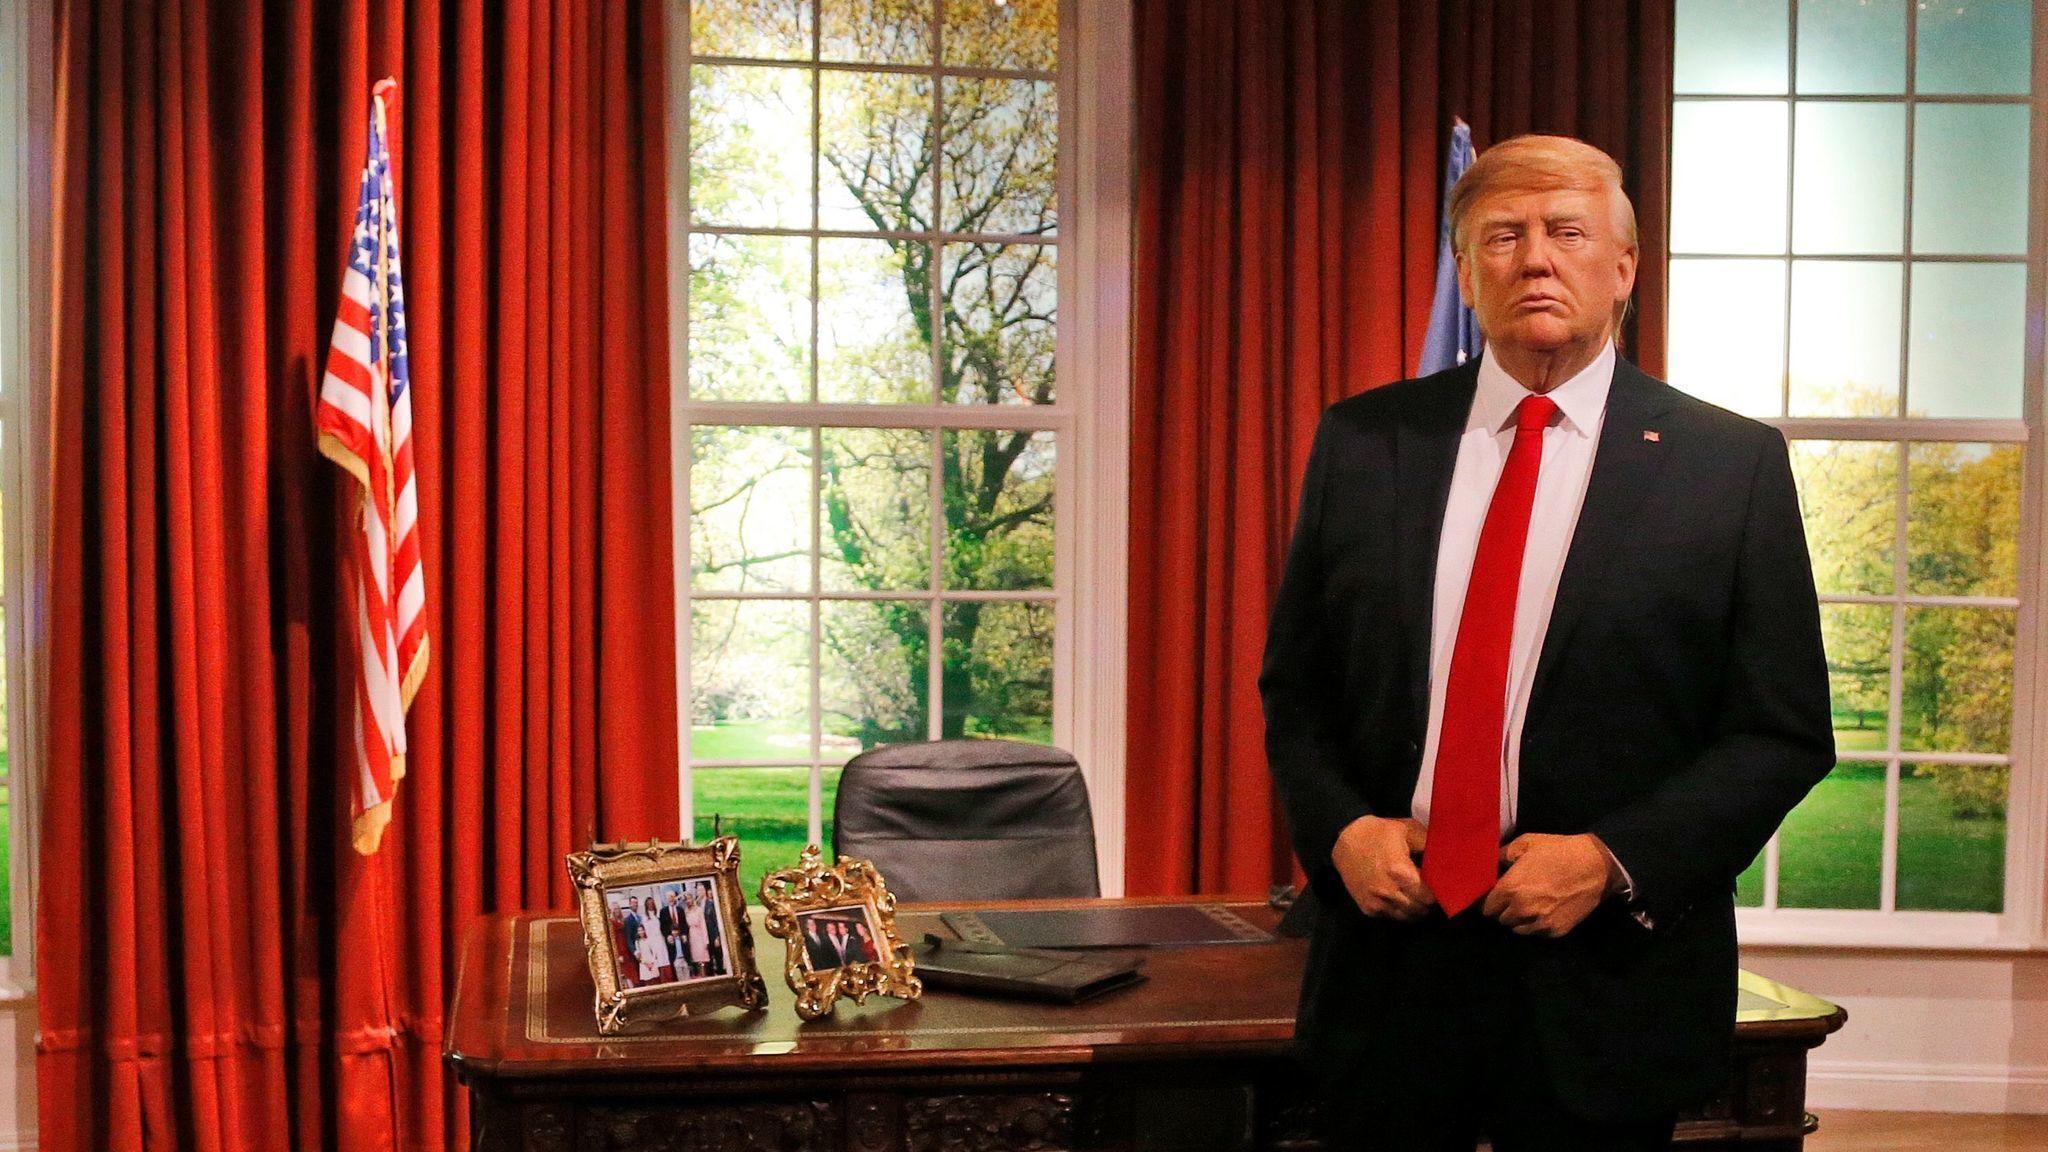 Trump wax figure unveiled at Madame Tussauds Orlando - Orlando ...